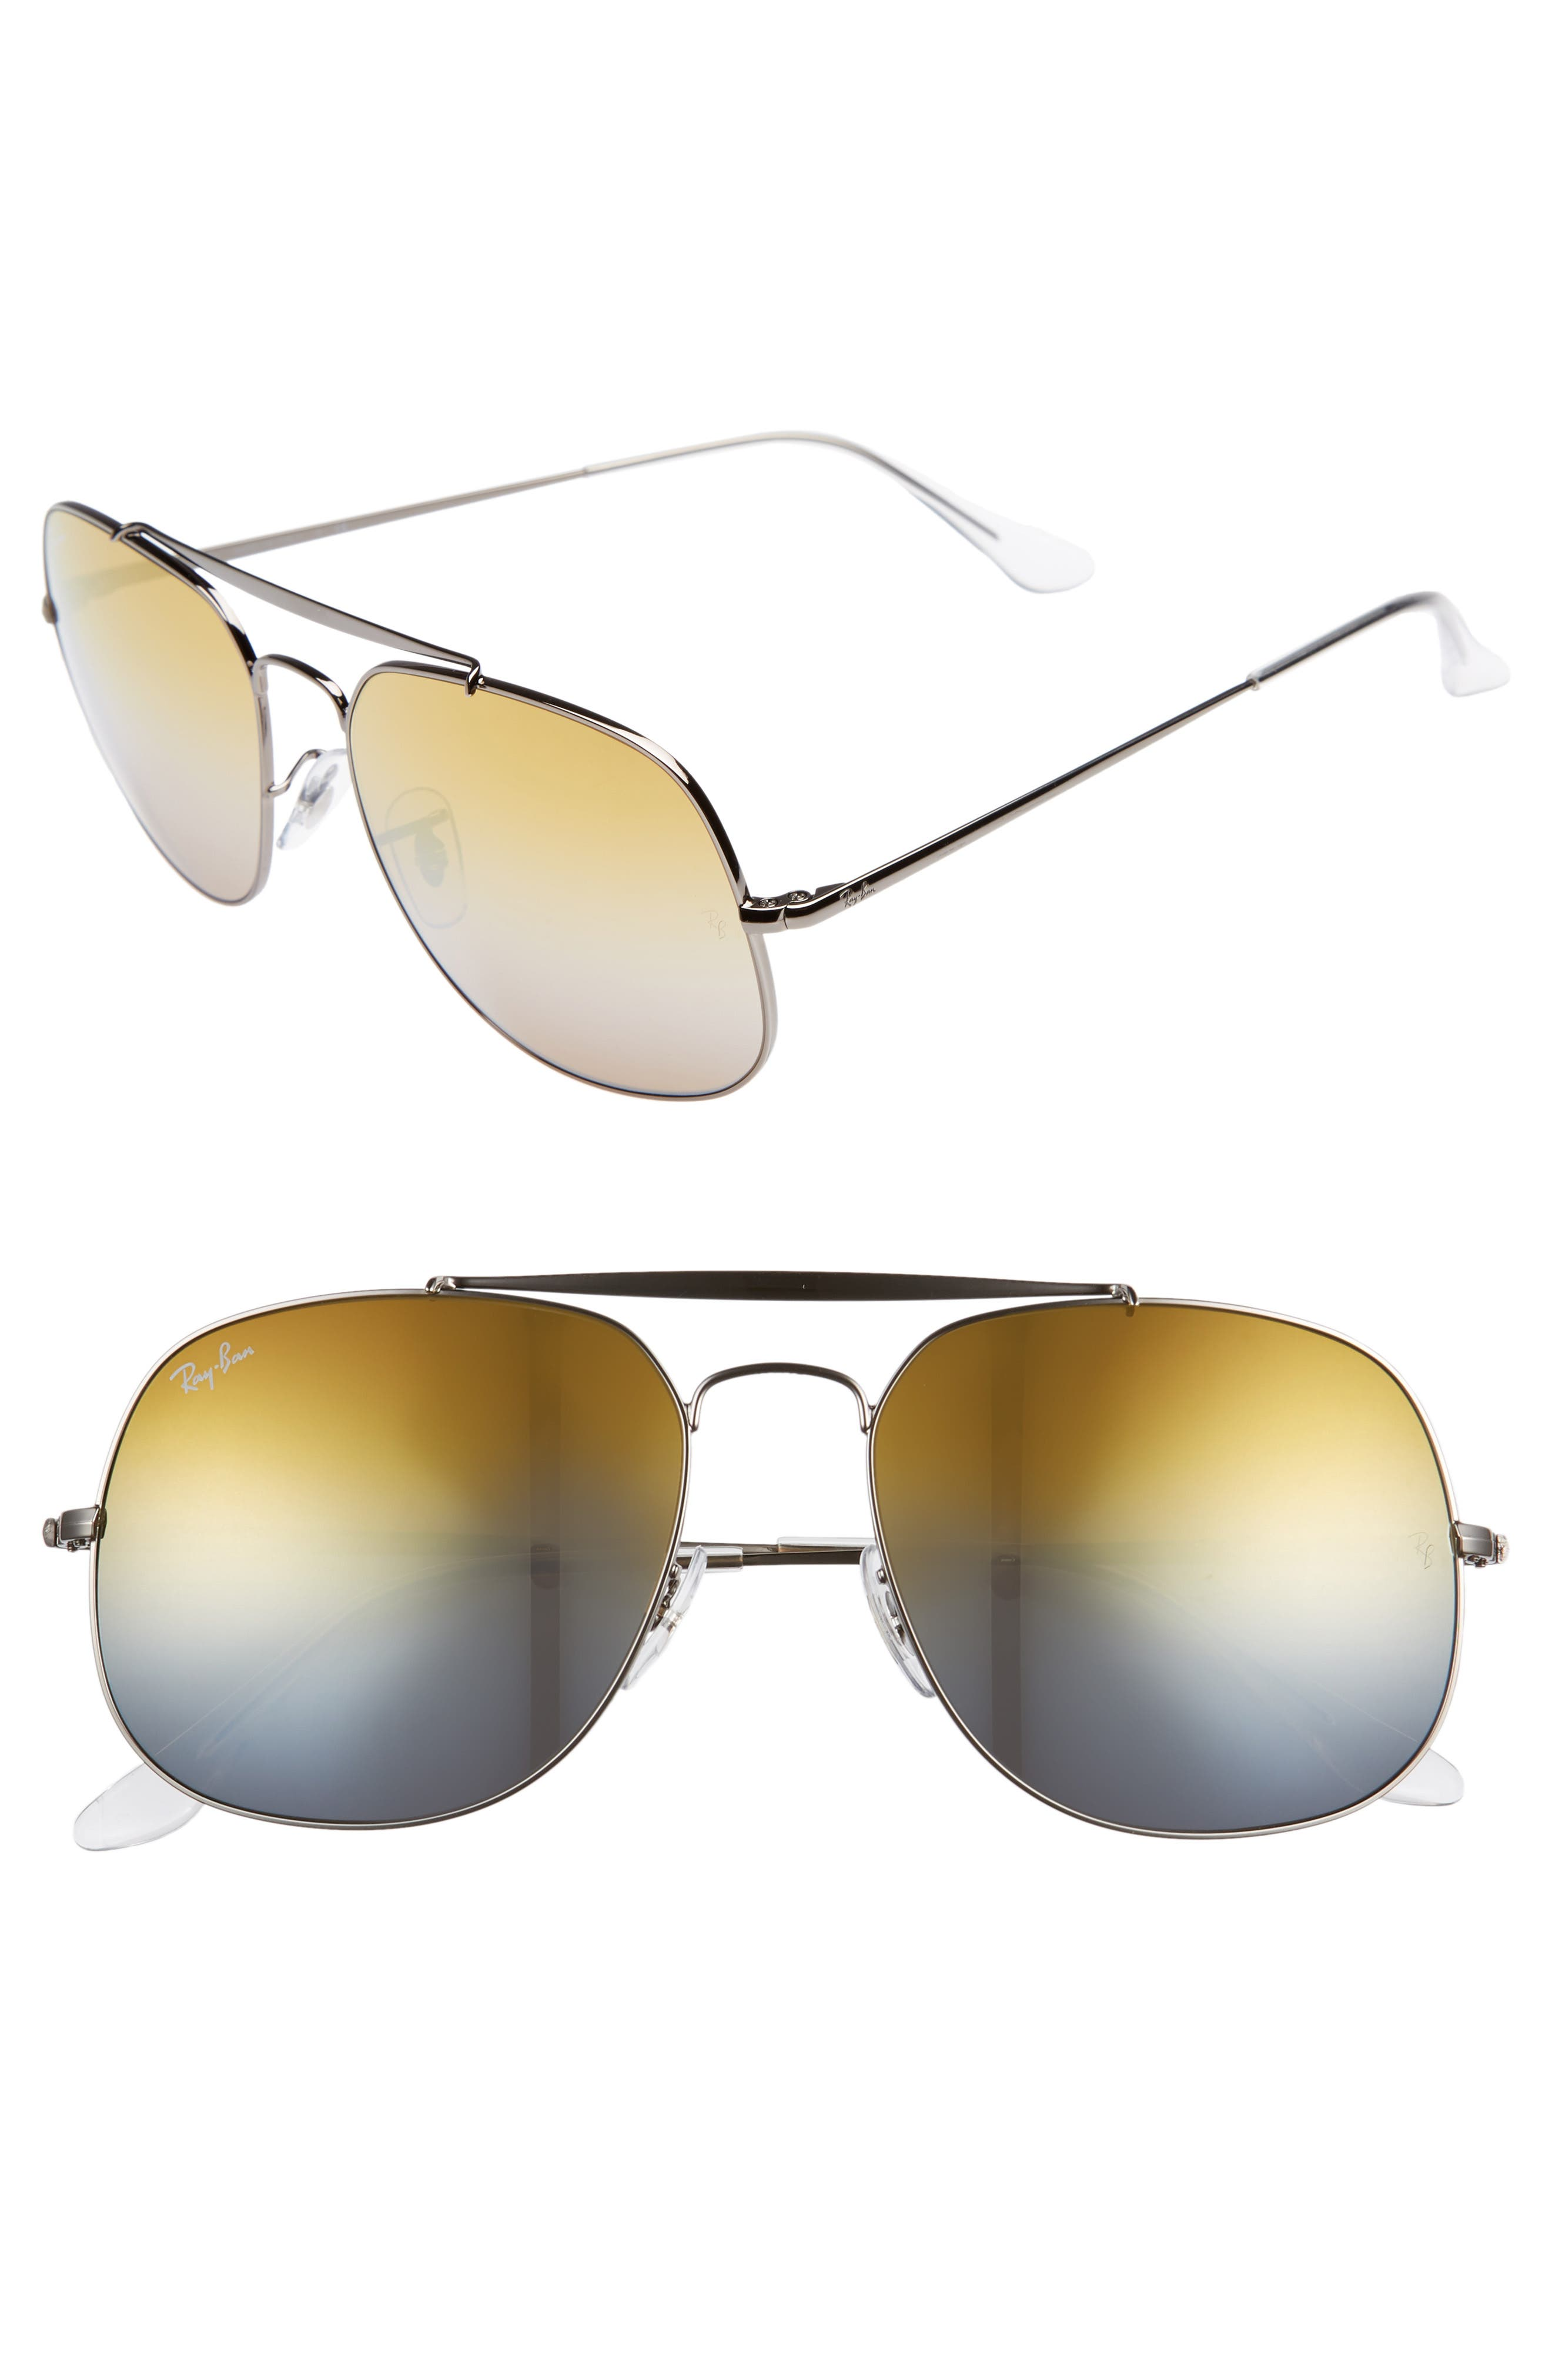 57mm Aviator Sunglasses,                         Main,                         color, Grey Orange